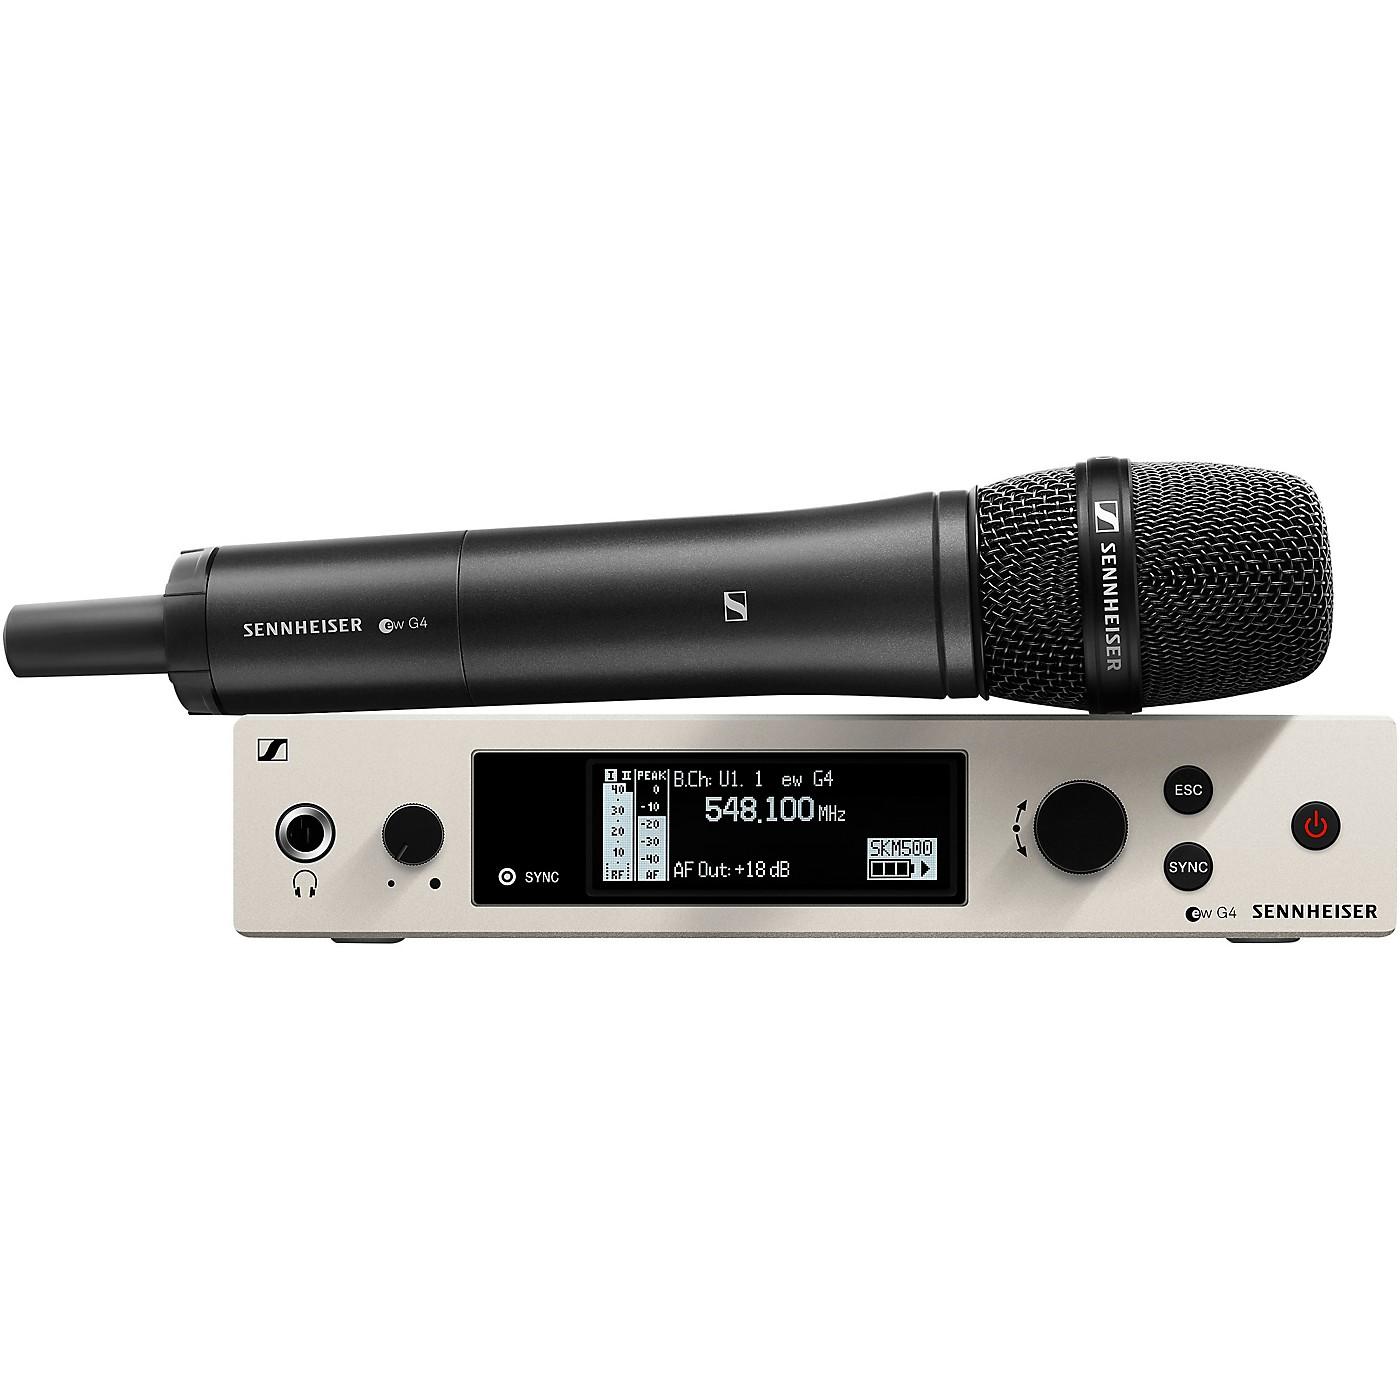 Sennheiser EW 500 G4-945 Wireless Handheld Microphone System thumbnail